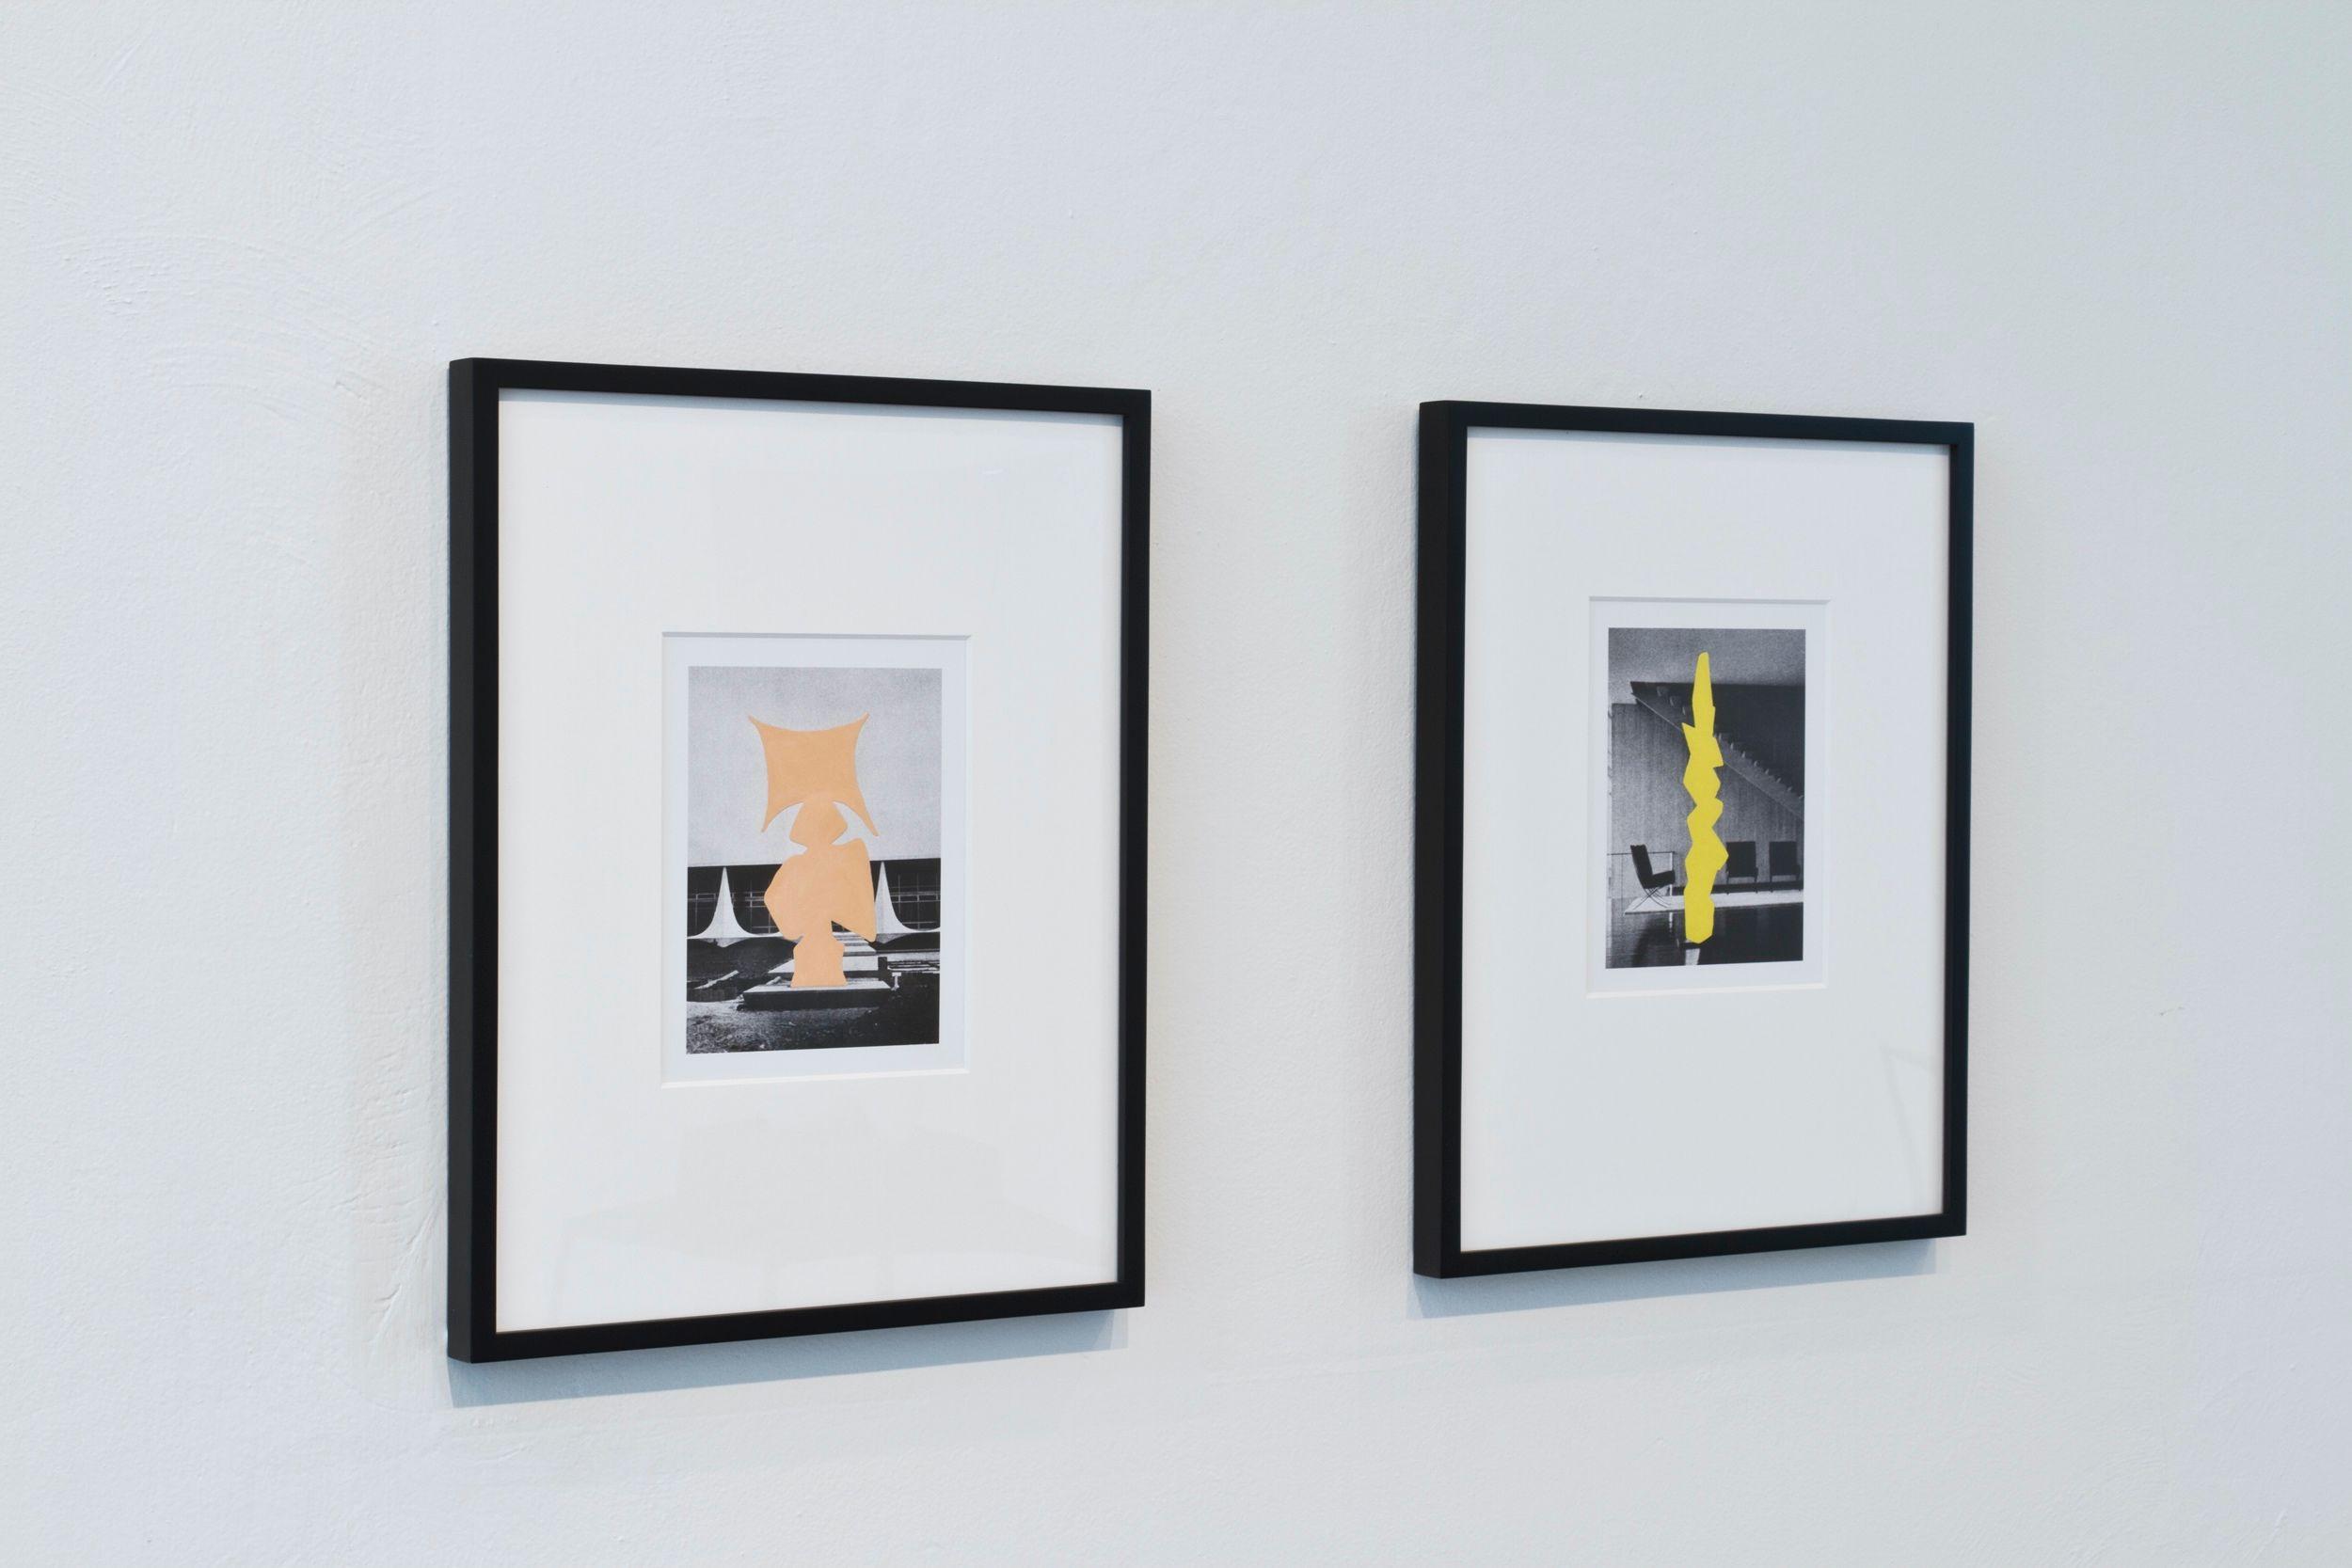 Art in Latin American Architecture |  Enamel on digital prints 40 x 30 cm each| 2012